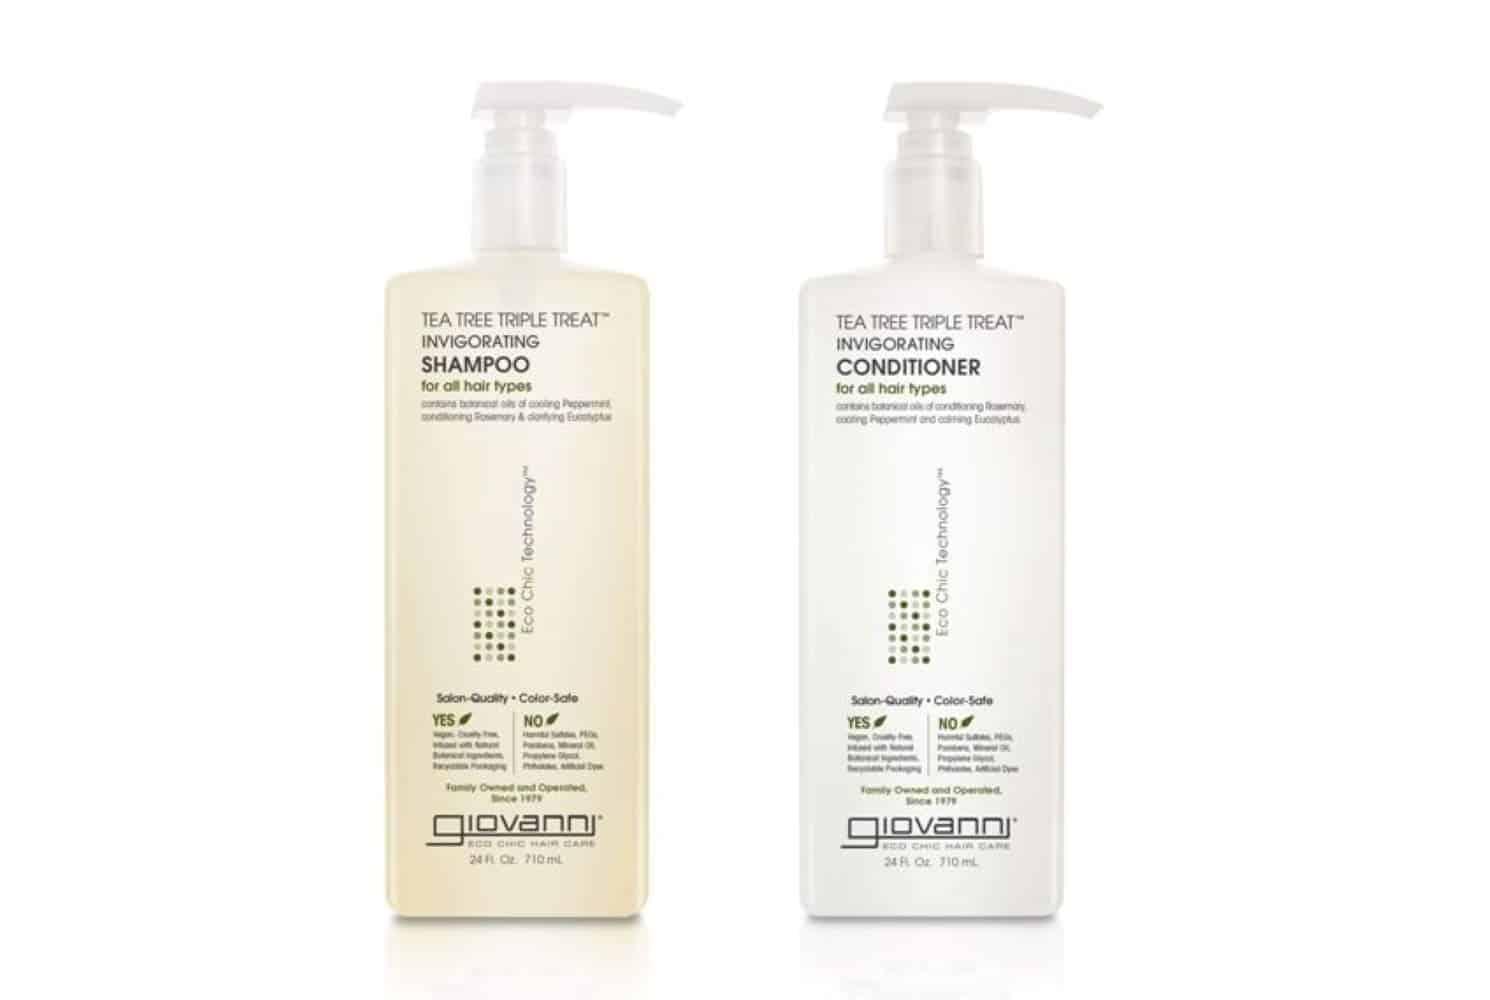 GIOVANNI Tea Tree Triple Treat Invigorating Shampoo & Conditioner Set Review